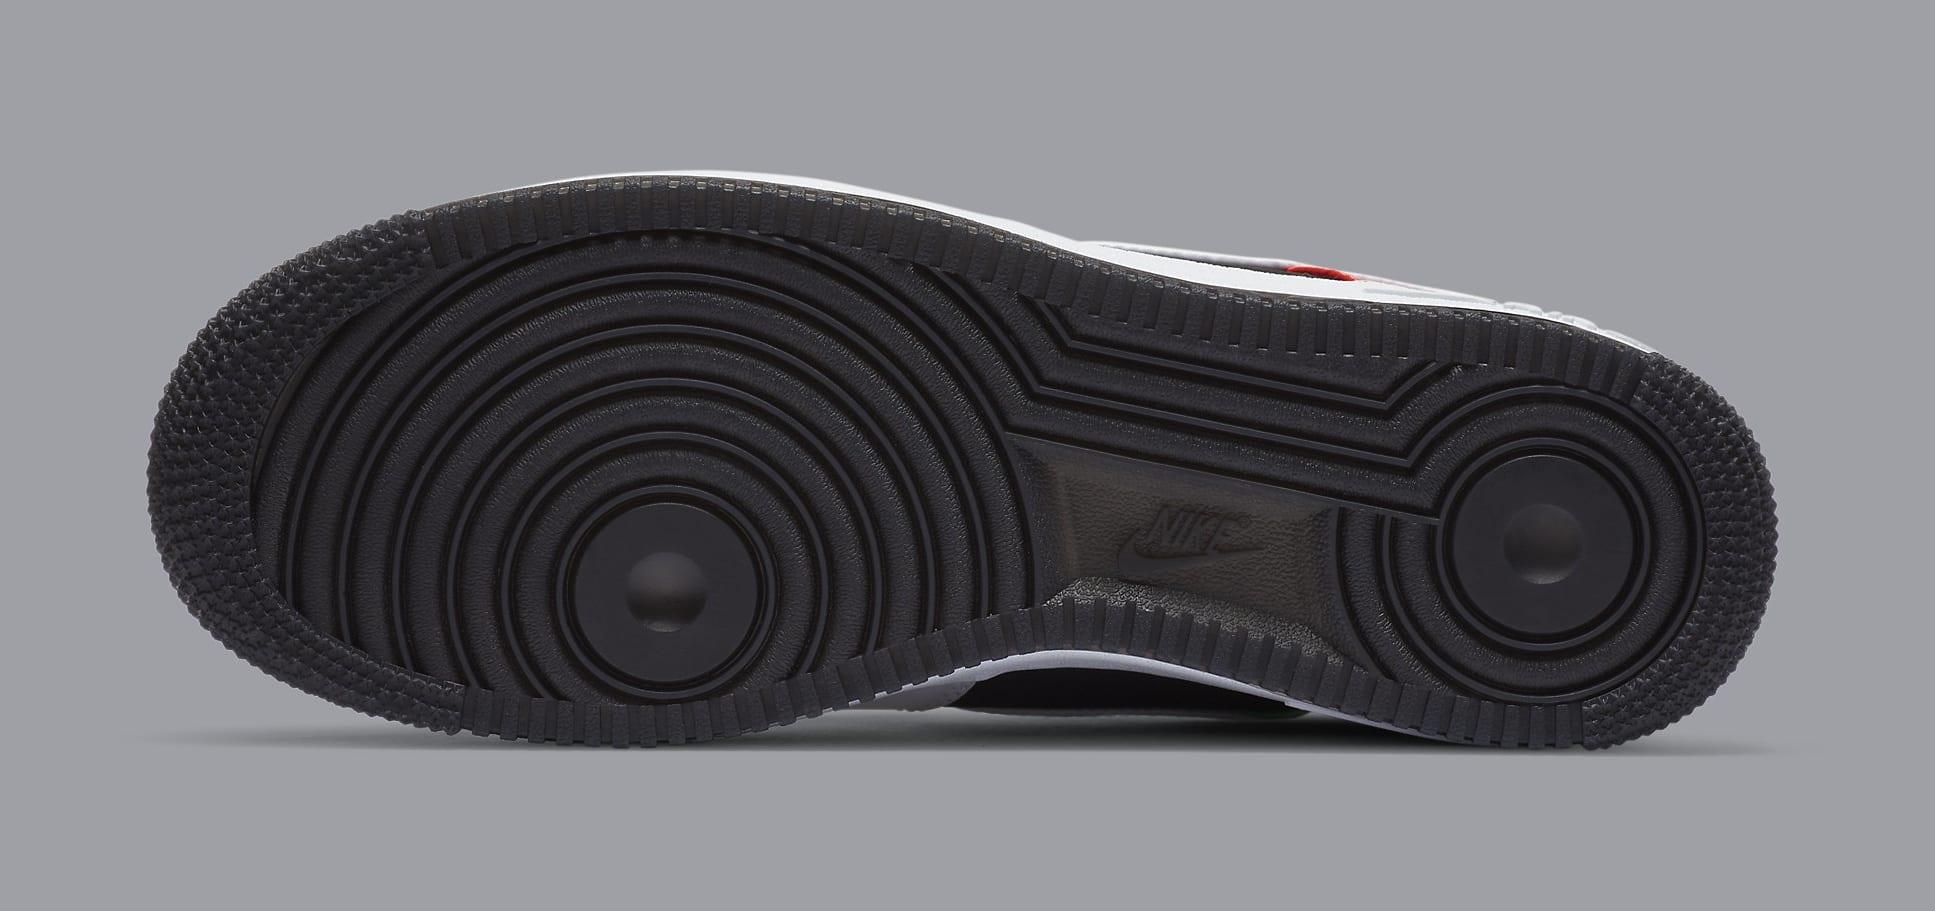 Nike Air Force 1 Low 'Hidden Message' DA1345-014 Outsole